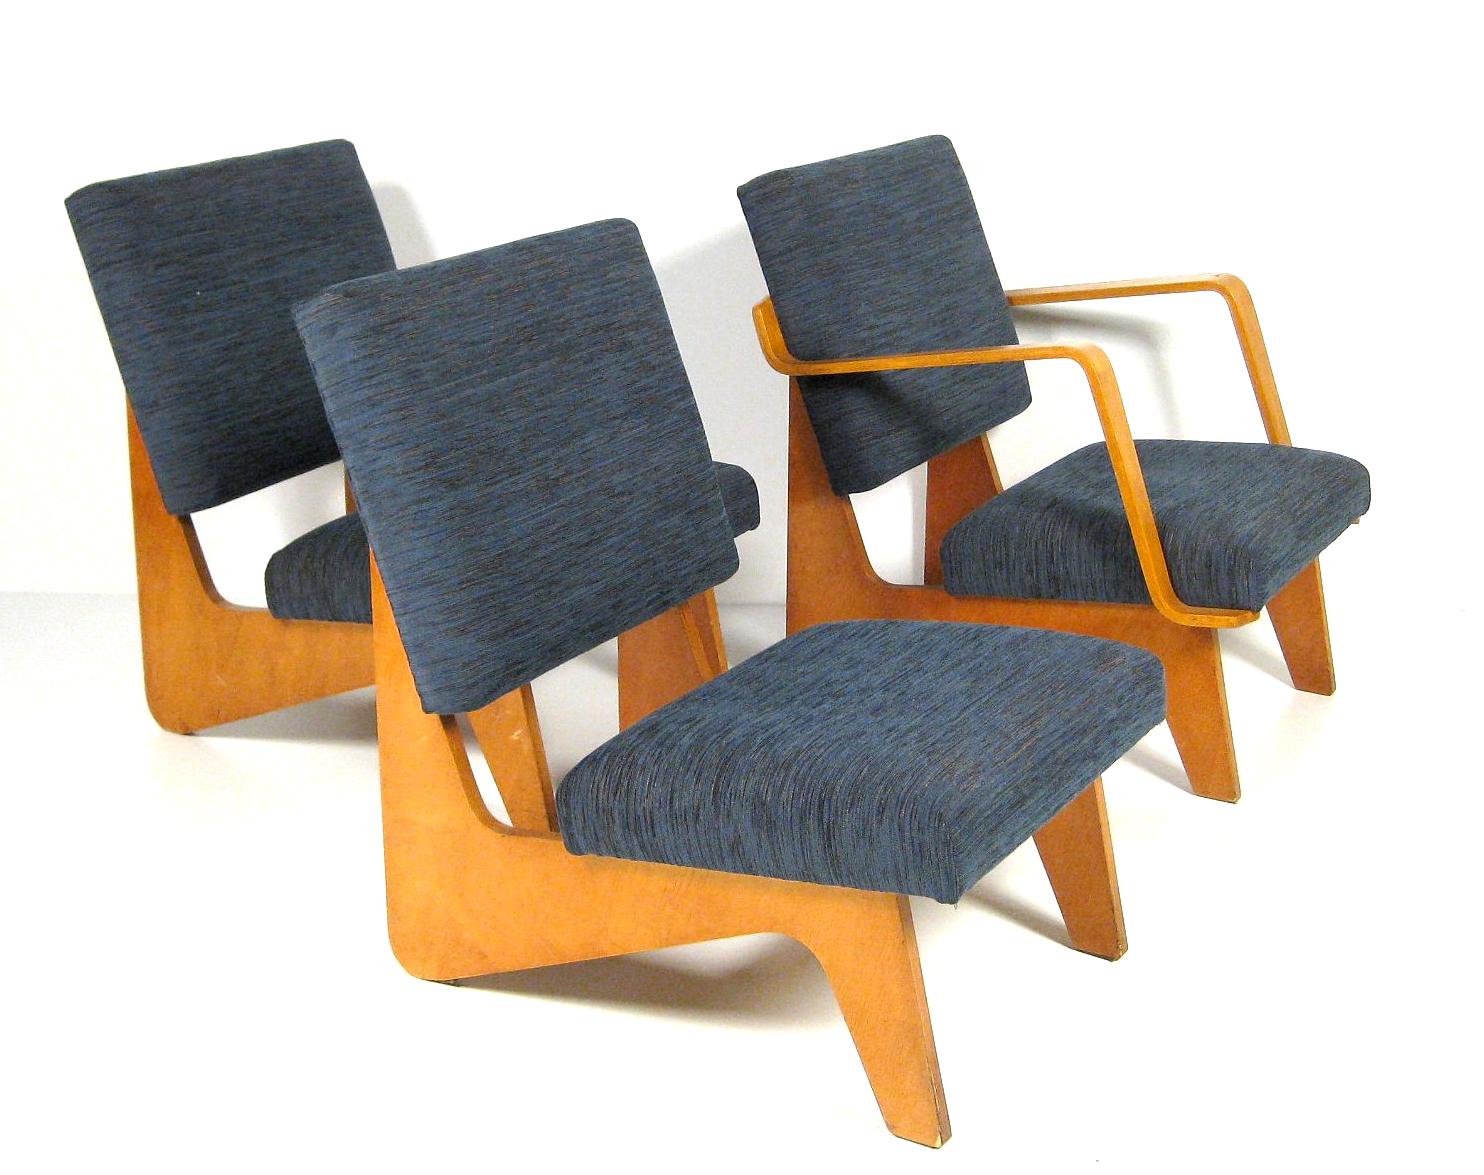 FB03 Combex Series Lounge Chairs, C. 1954. Via Lauritz, Denmark